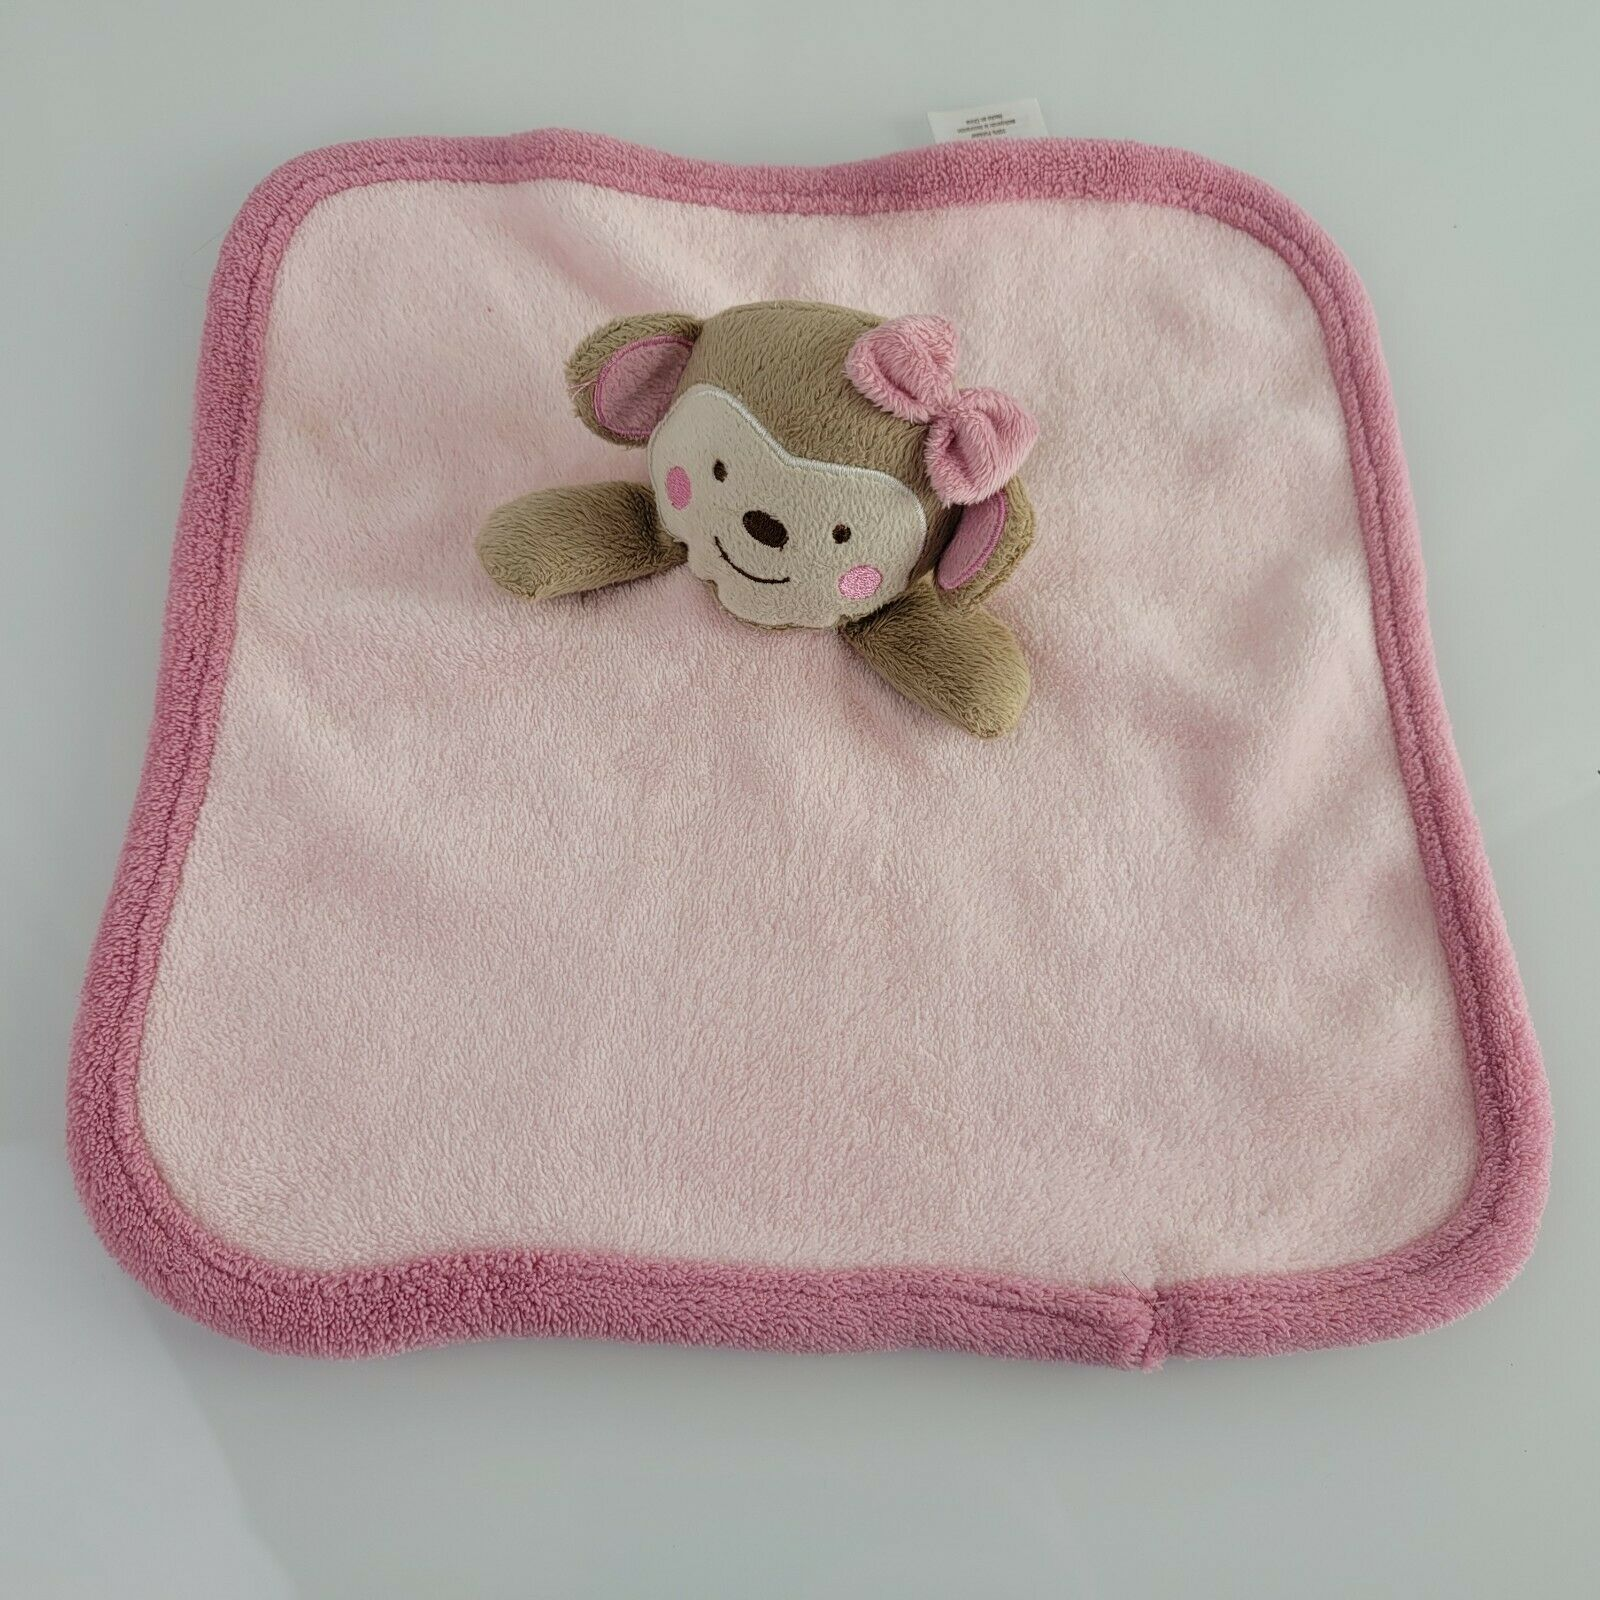 "Koala Baby Pink Tan Monkey Soft Security Blanket Lovey 13"" x 13"" 2013 - $29.69"